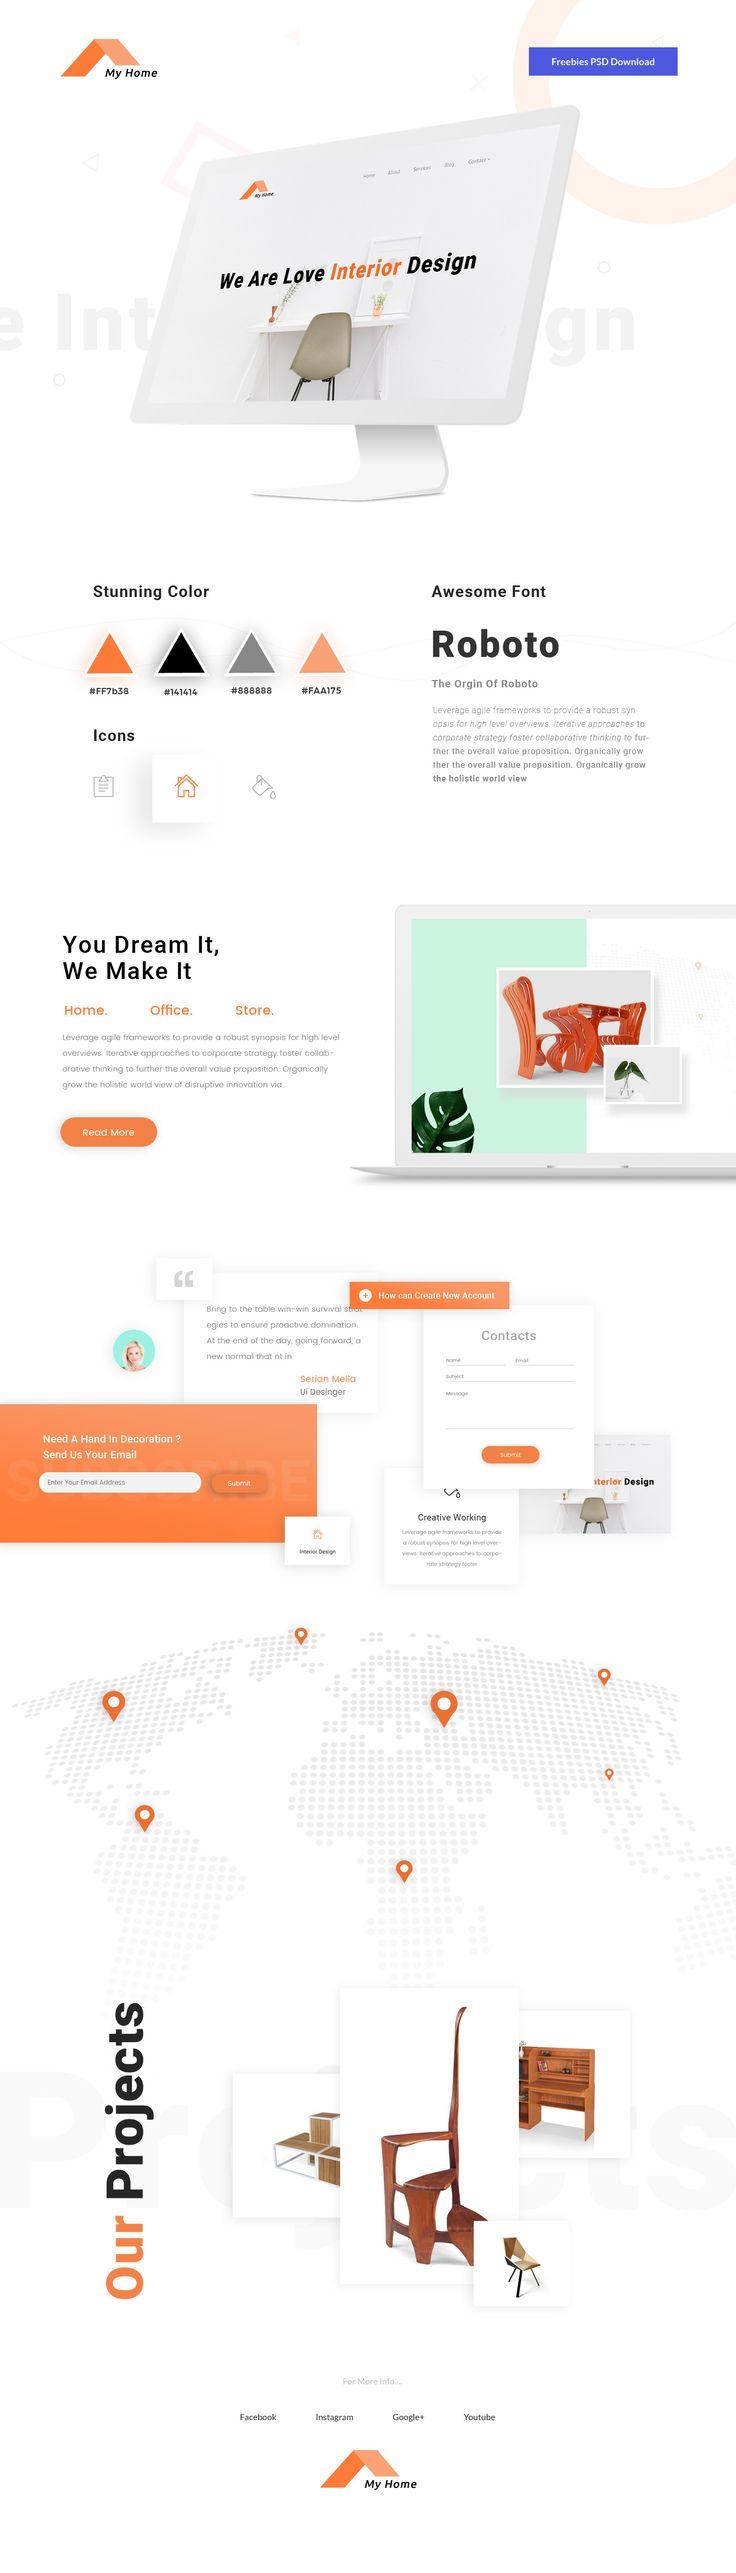 Design Studio Web Template Free PSD